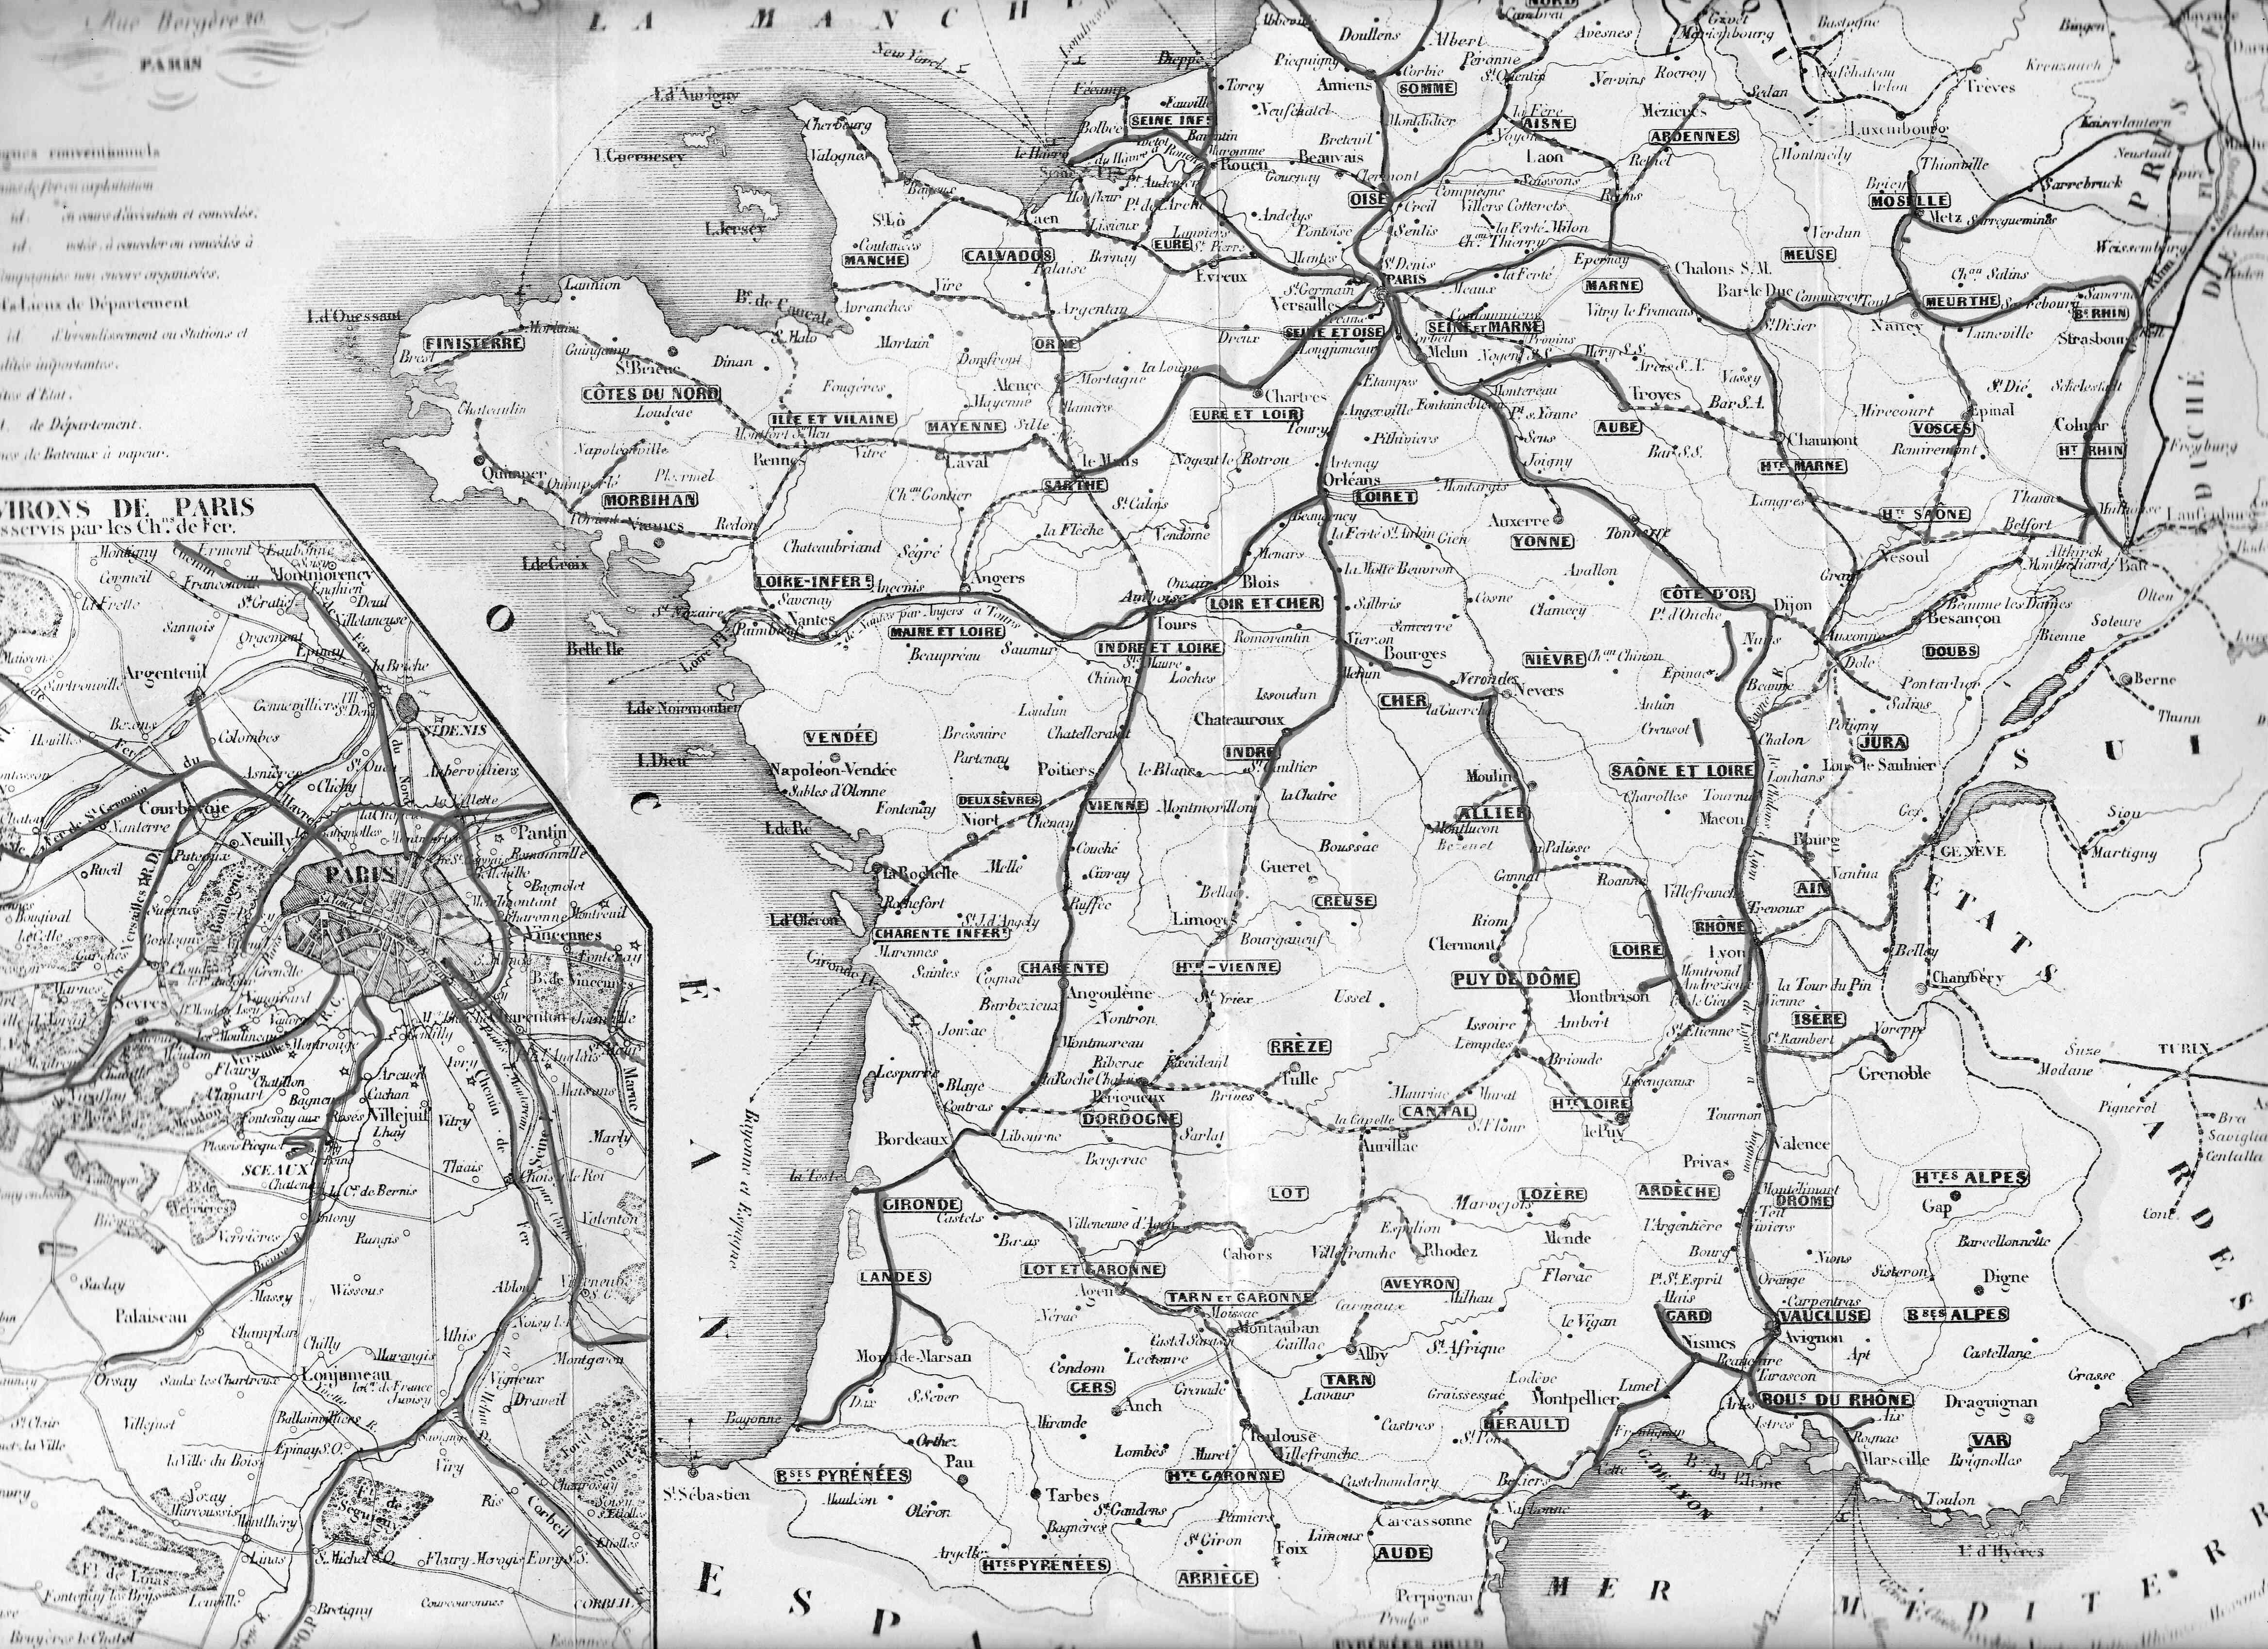 Carte chaix 1854-1855 France